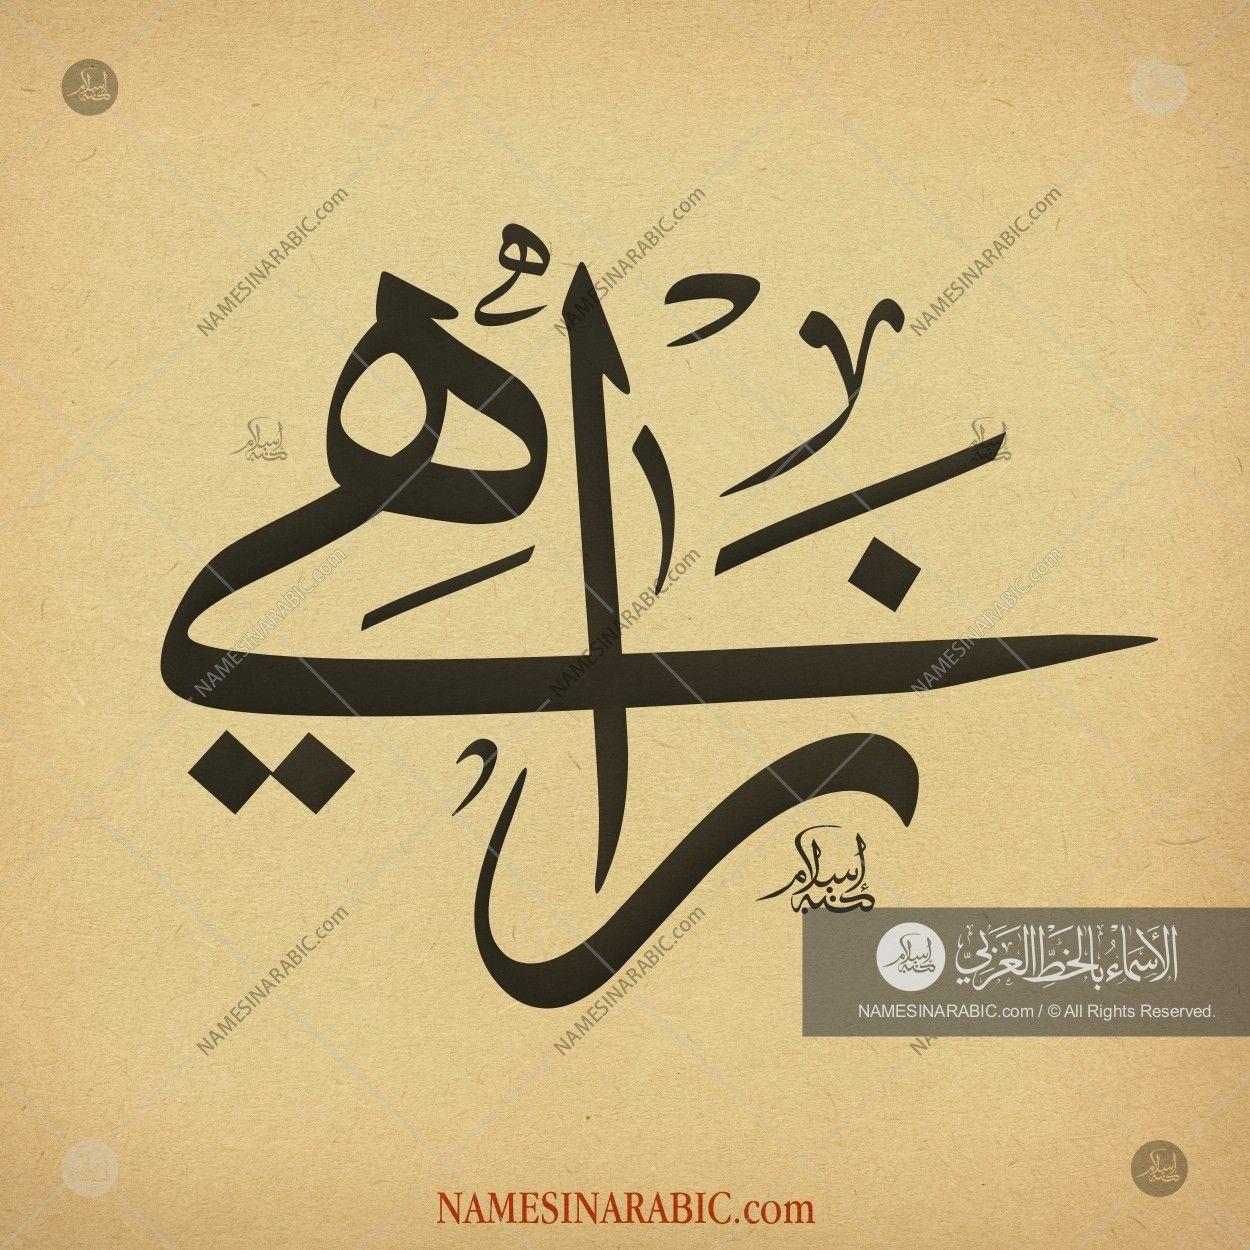 Zahi زاهي Names In Arabic Calligraphy Name 3567 Calligraphy Name Calligraphy Logo Design Inspiration Branding